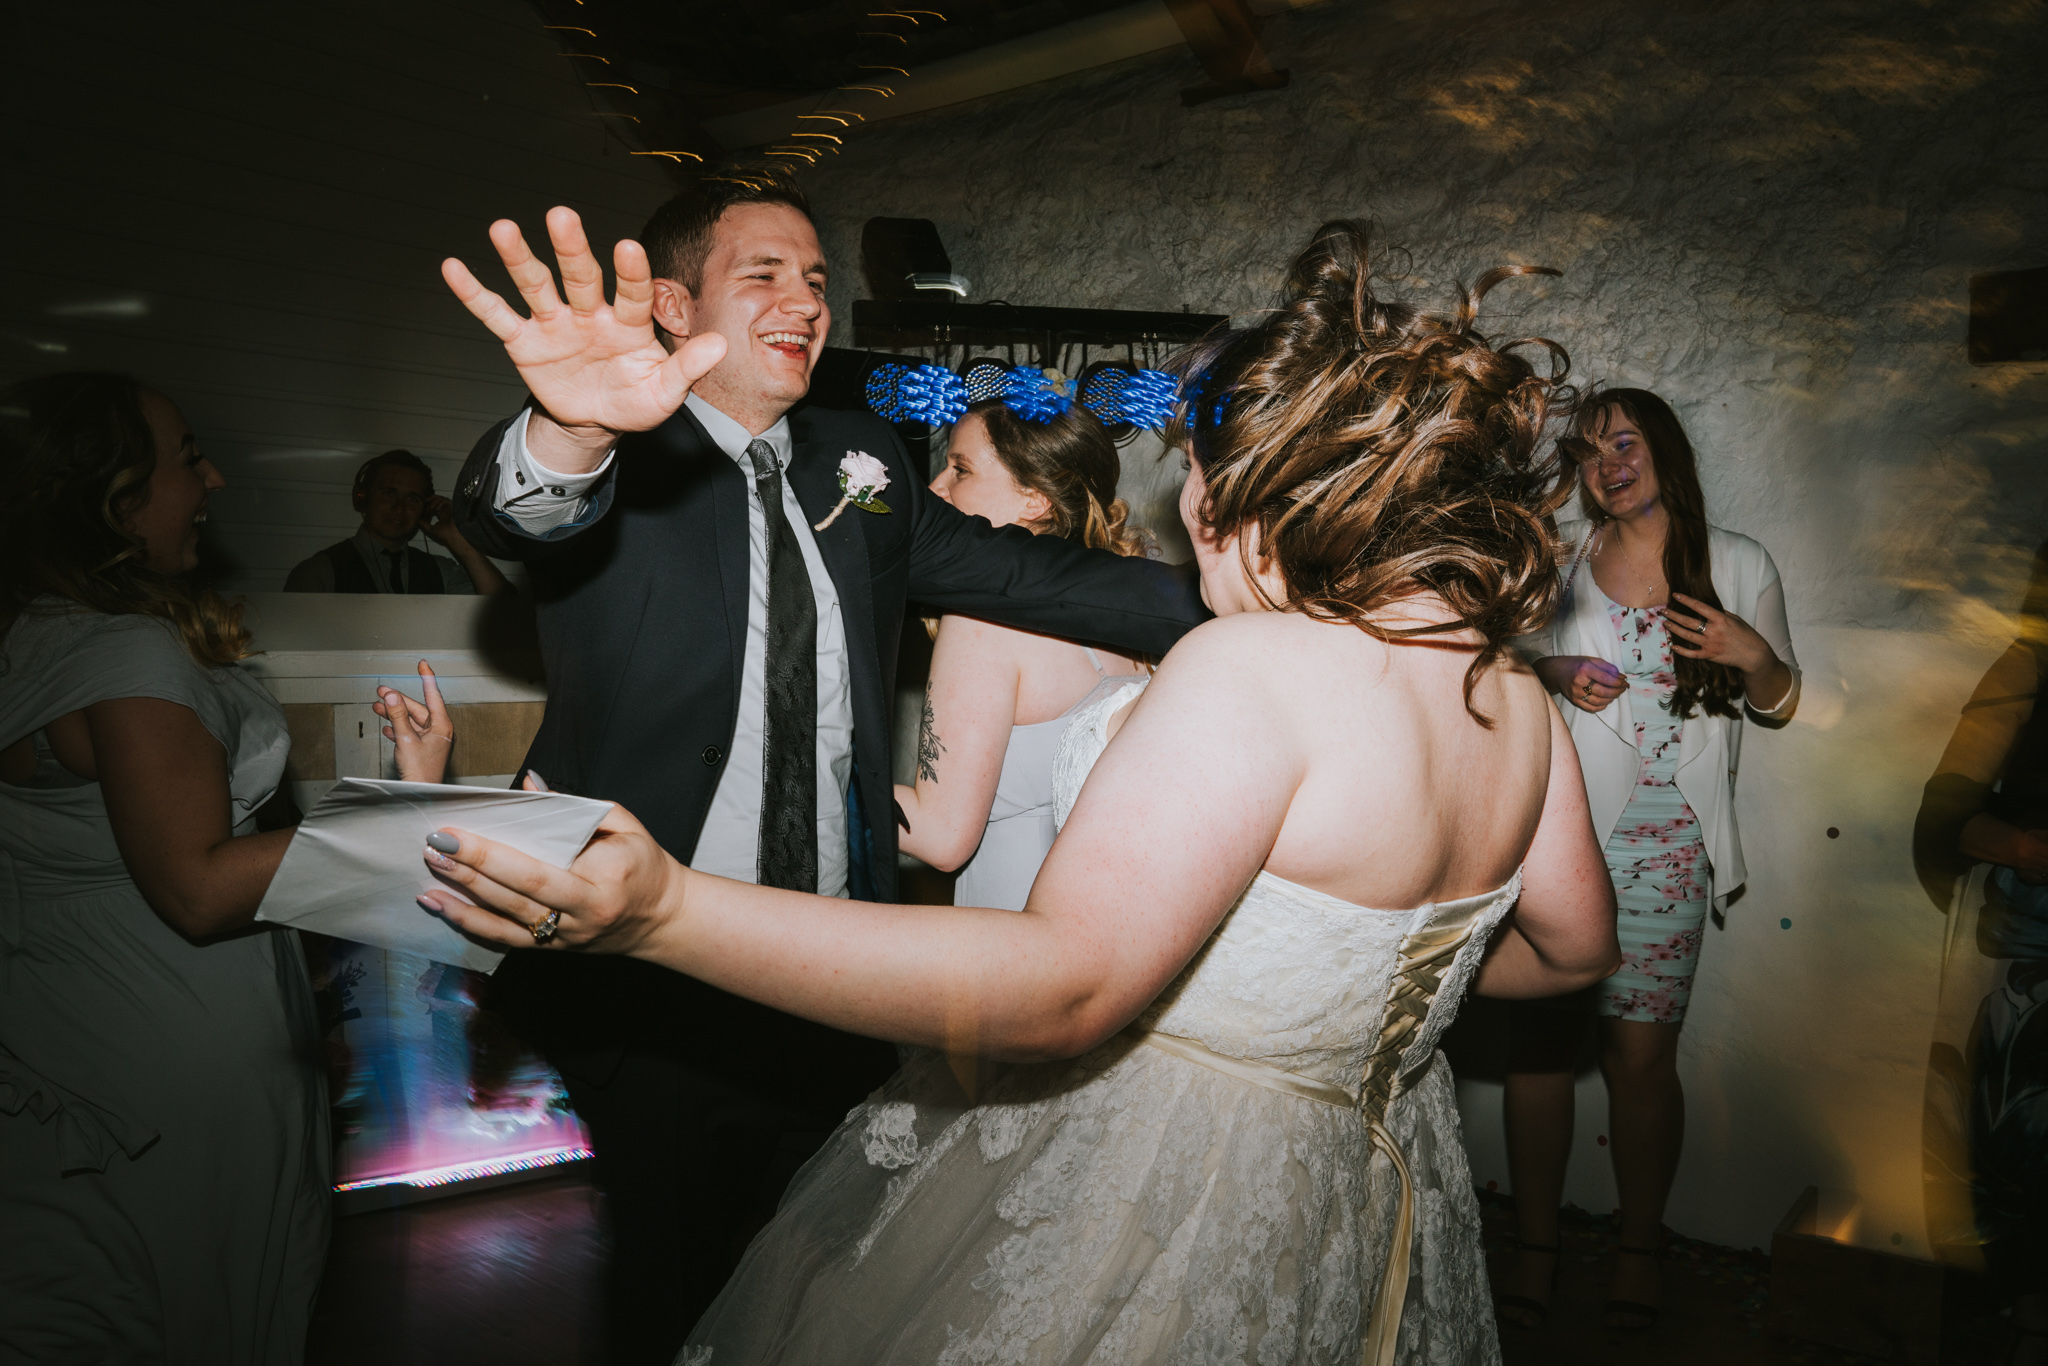 grace-sam-old-barn-clovelly-devon-wedding-photographer-grace-elizabeth-essex-suffolk-norfolk-wedding-photographer (124 of 132).jpg